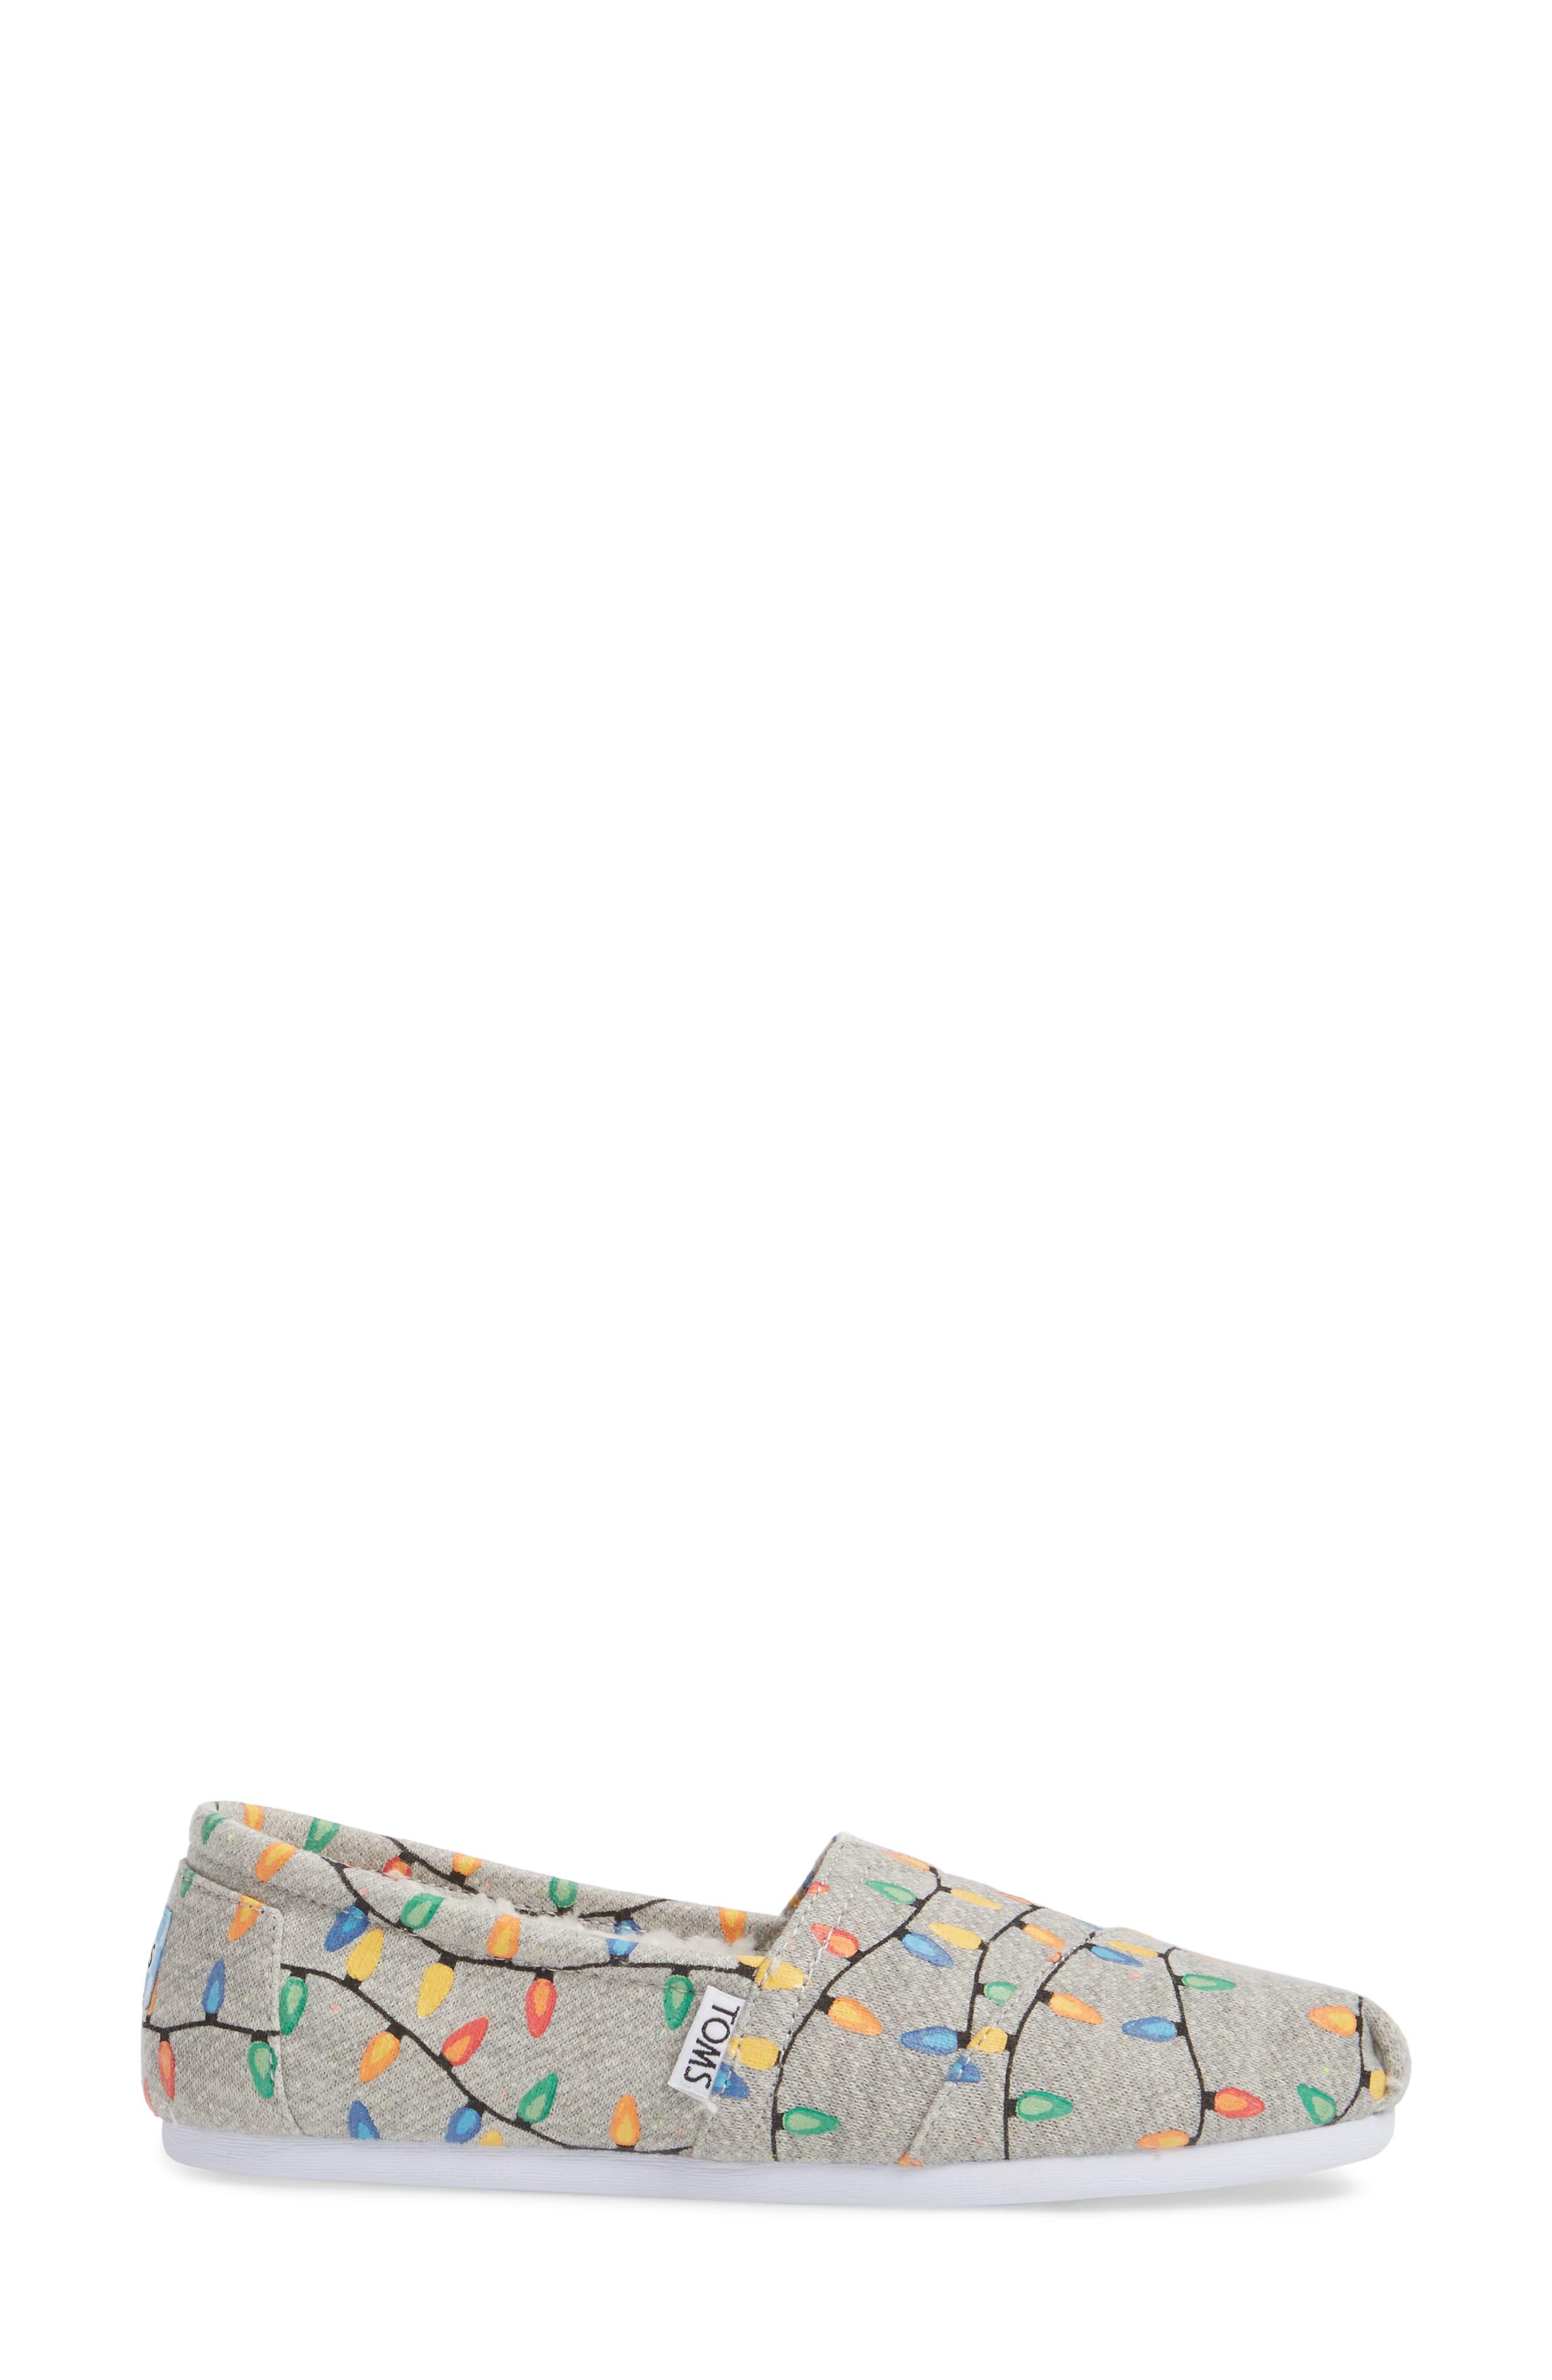 'Classic Knit' Slip-On,                             Alternate thumbnail 3, color,                             Grey